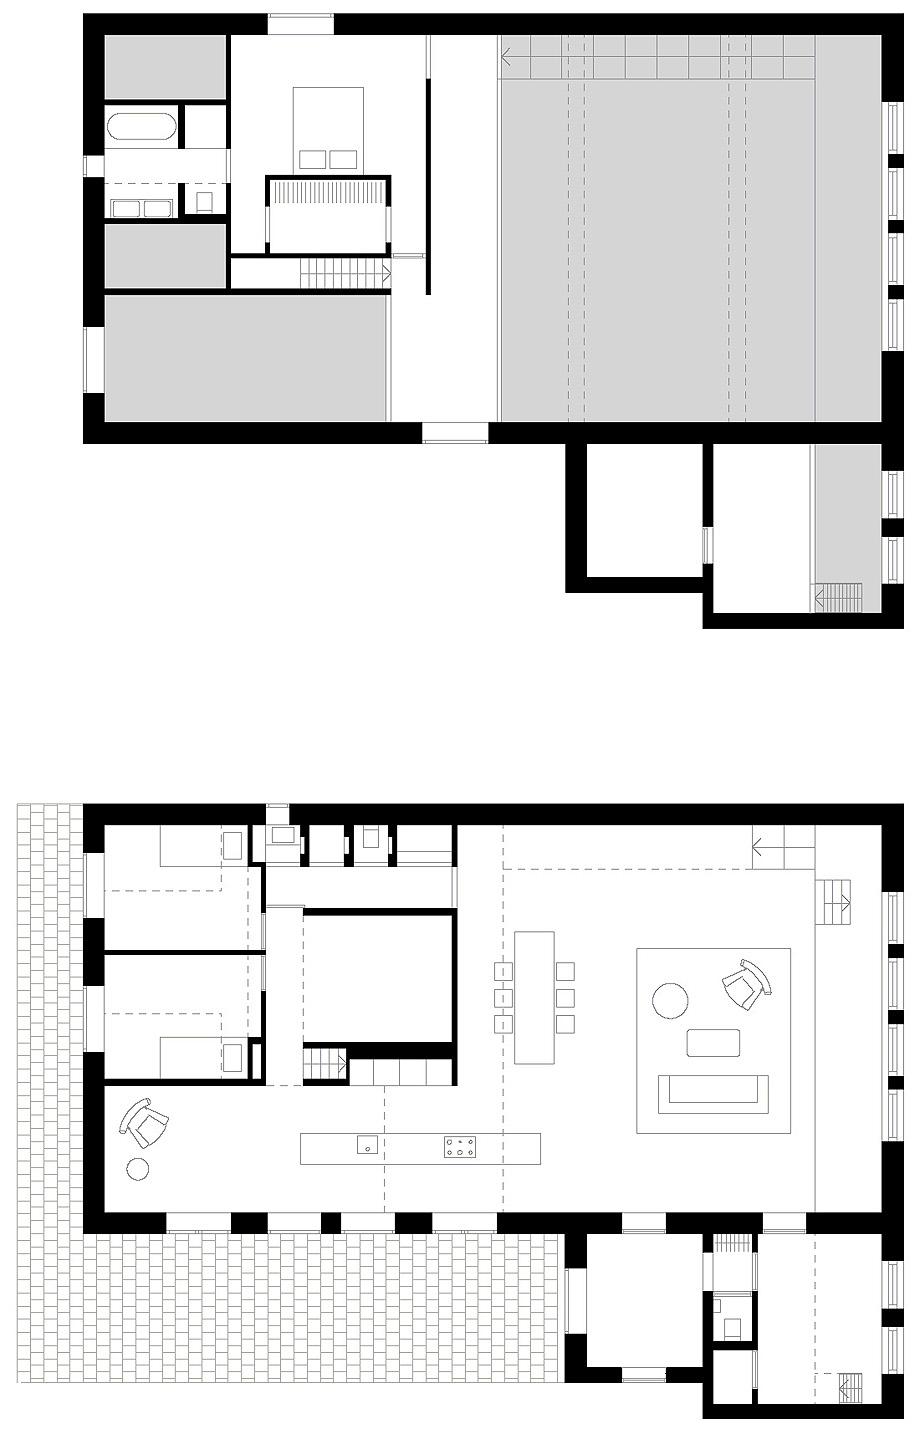 gym loft de eklund_terbeek - plano (14)